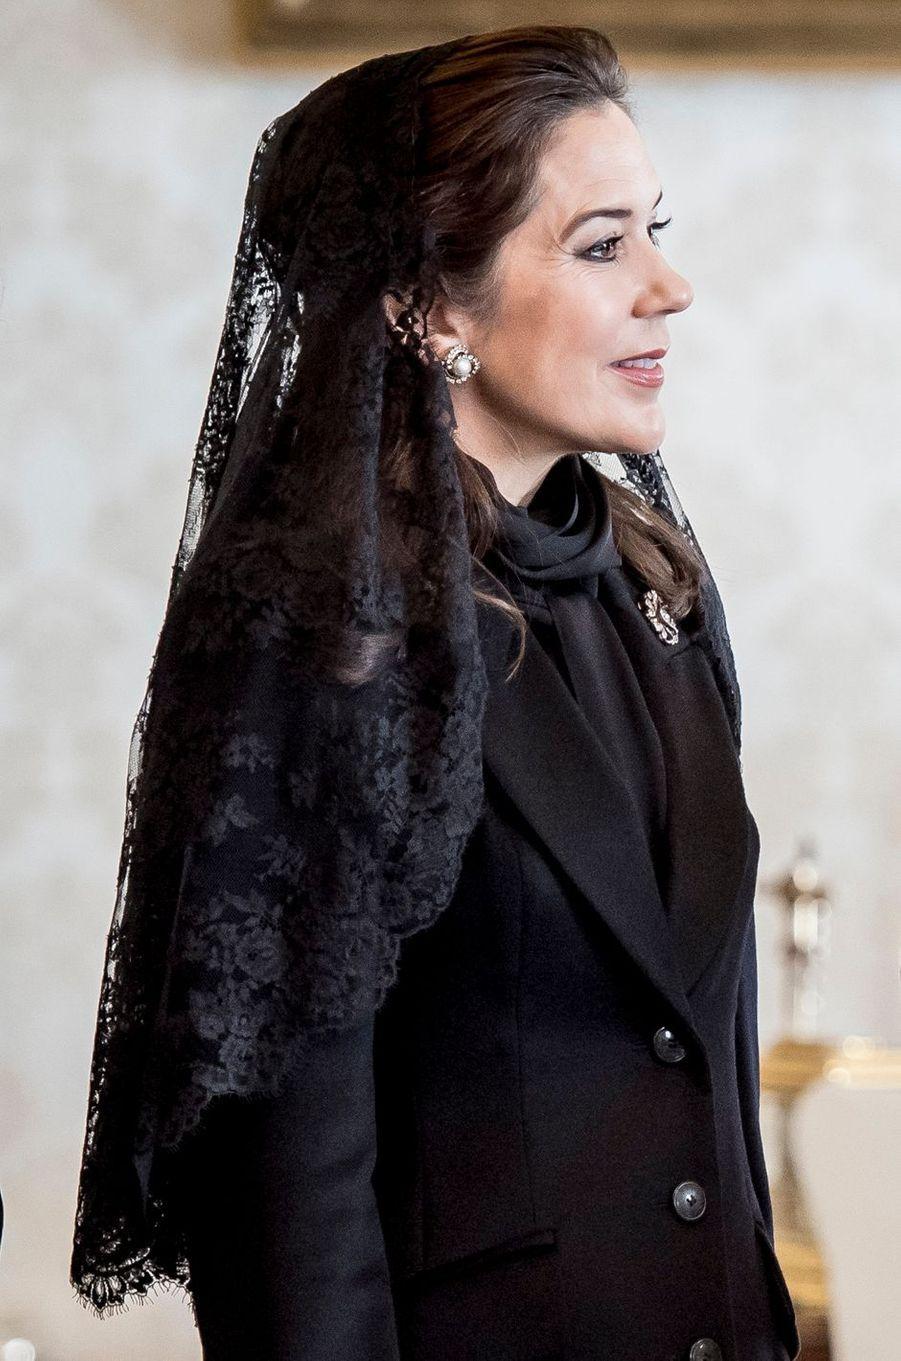 La princesse Mary de Danemark au Vatican, le 8 novembre 2018